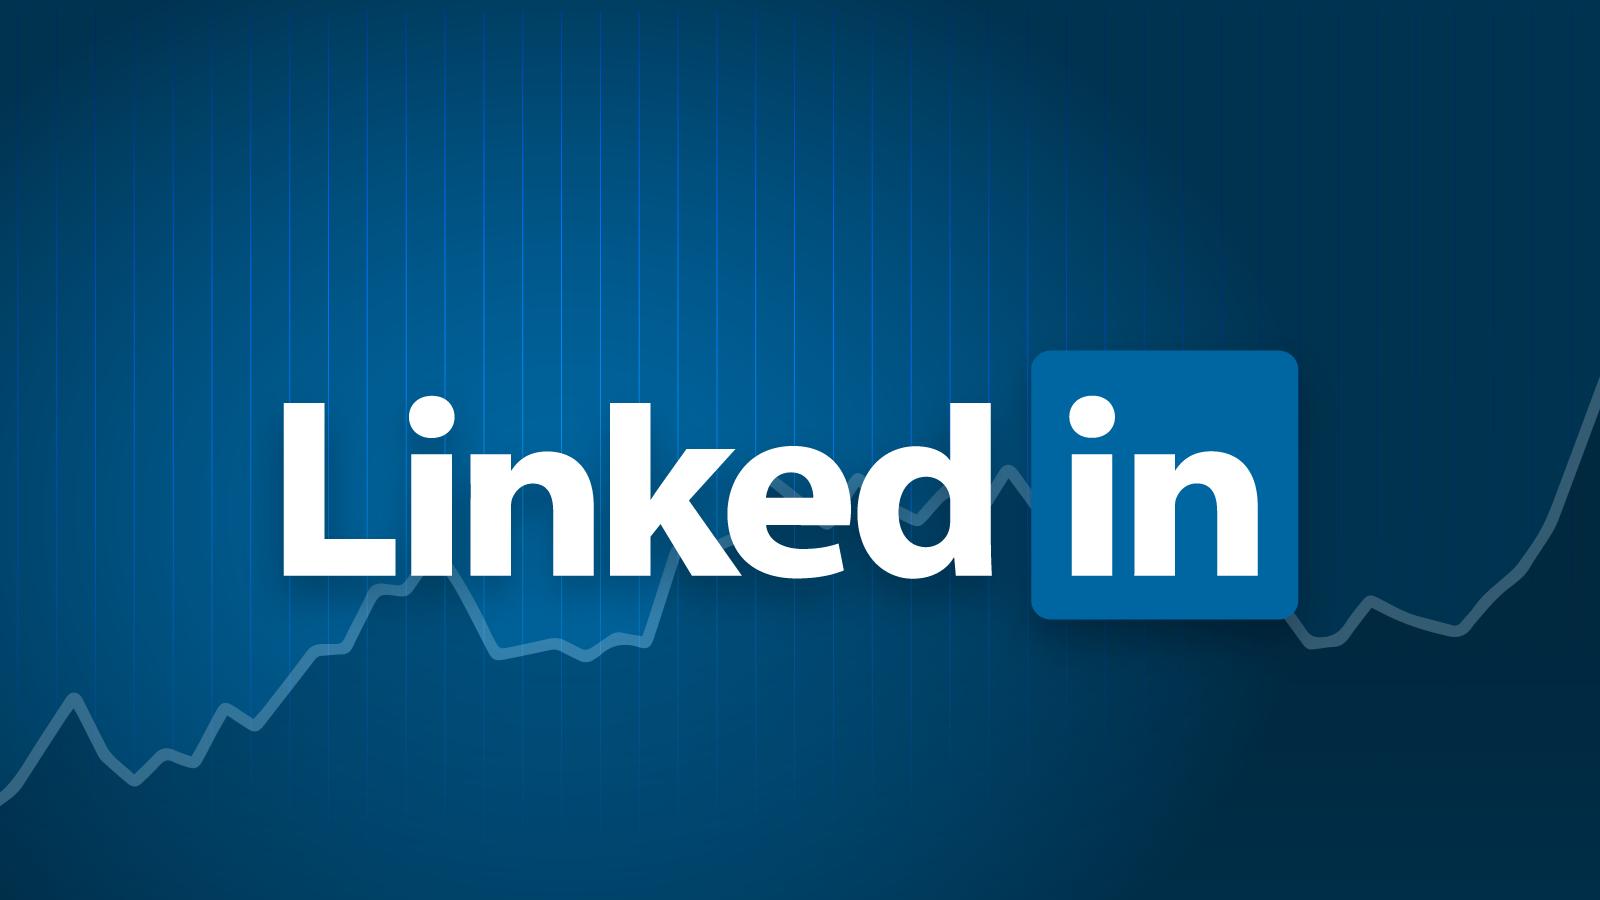 Linkedin Users Email List Database